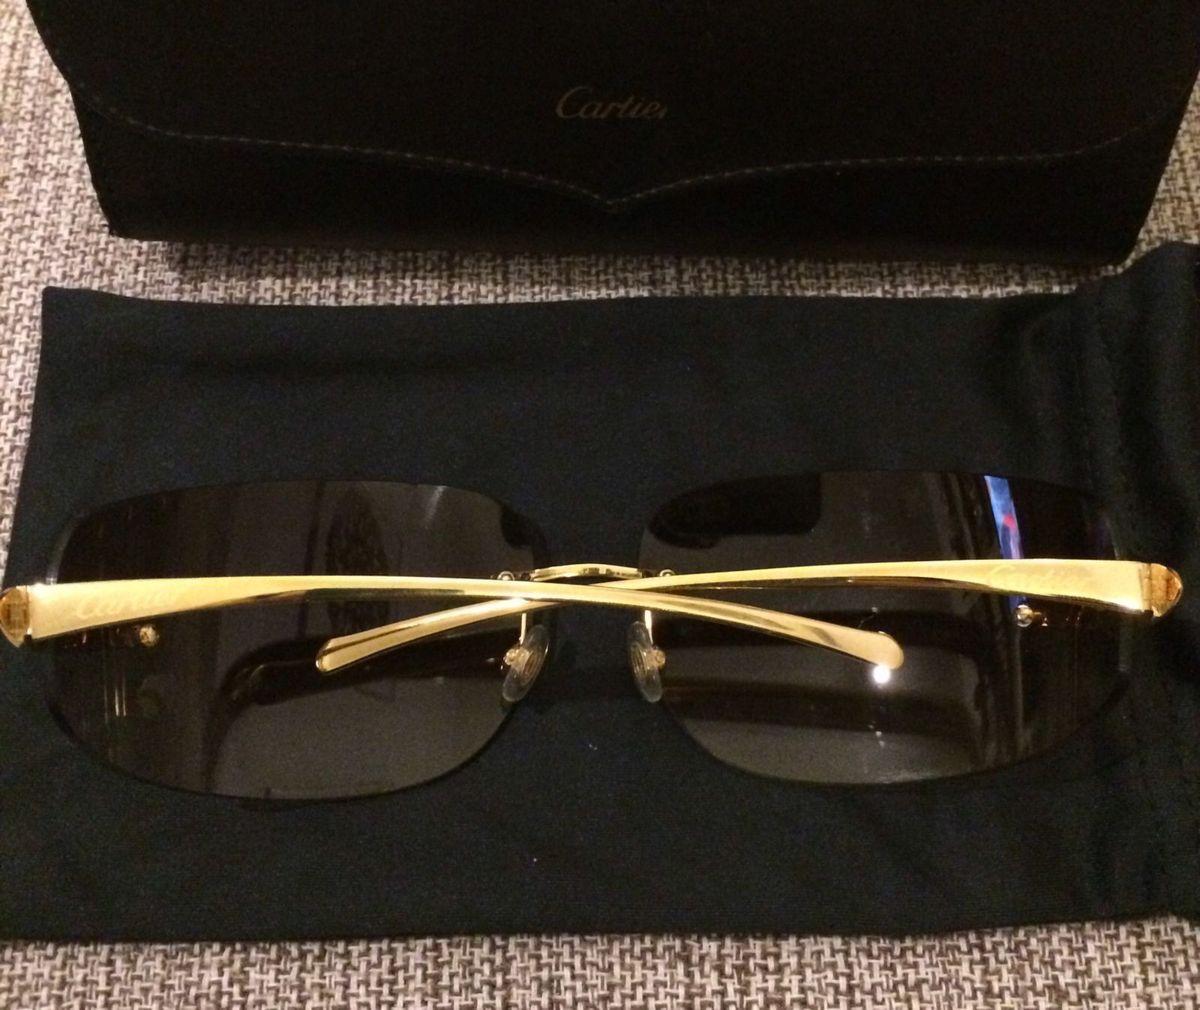 02f3ab36299 óculos pantera cartier - óculos cartier.  Czm6ly9wag90b3muzw5qb2vplmnvbs5ici9wcm9kdwn0cy85mtu4ms9jymuzngvky2mxymq0mmvhzme4yjdlodflndk0mgzlmy5qcgc  ...